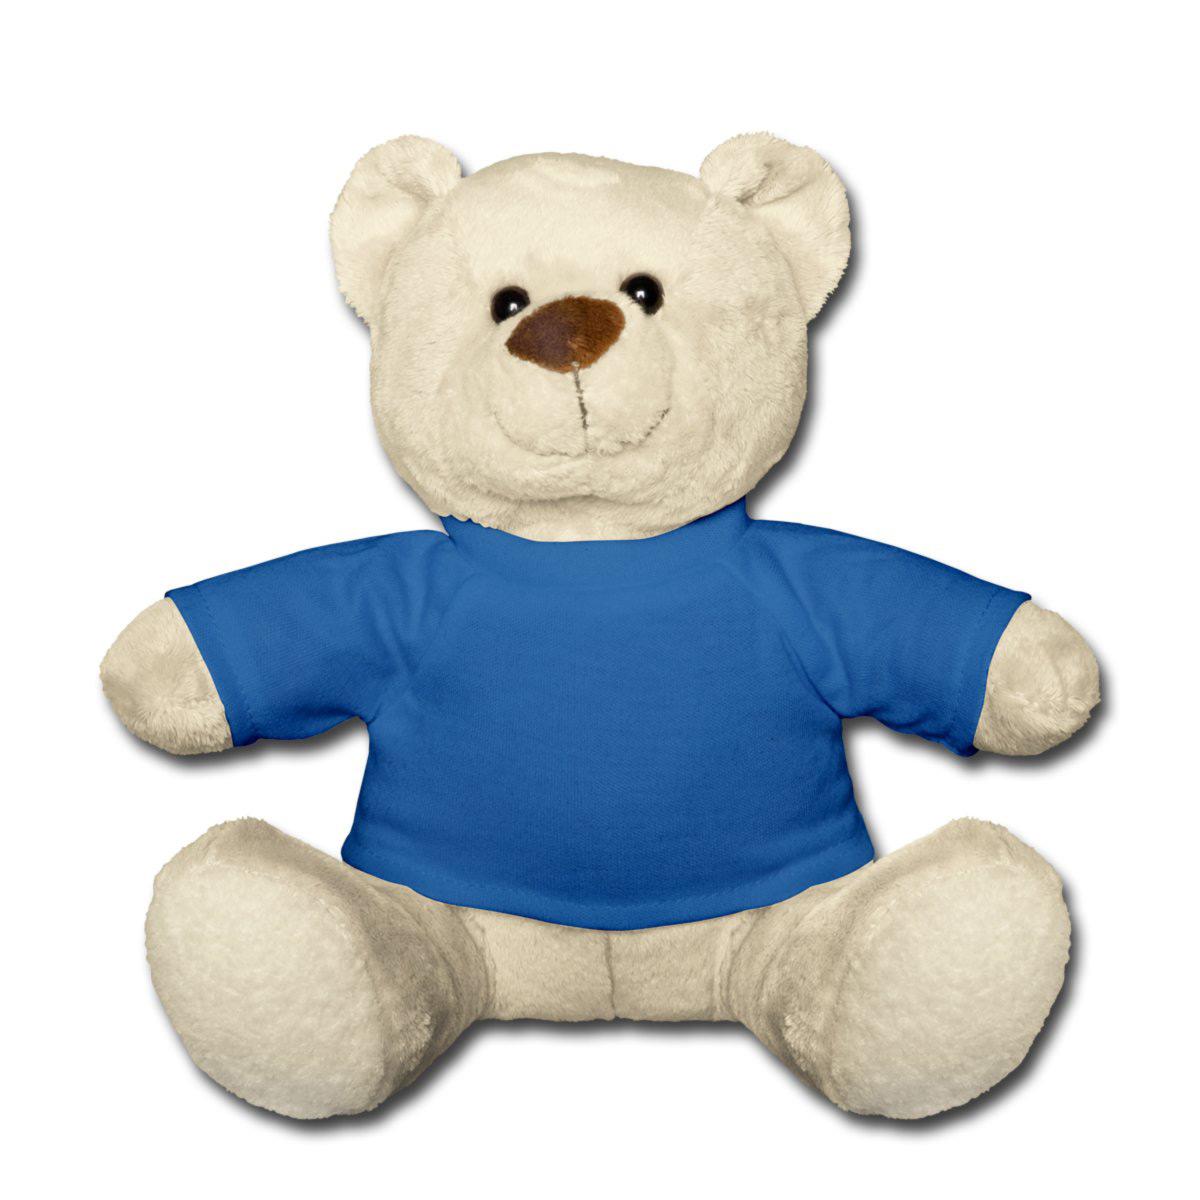 Teddybären bedrucken - Teddybär mit Namen gestalten